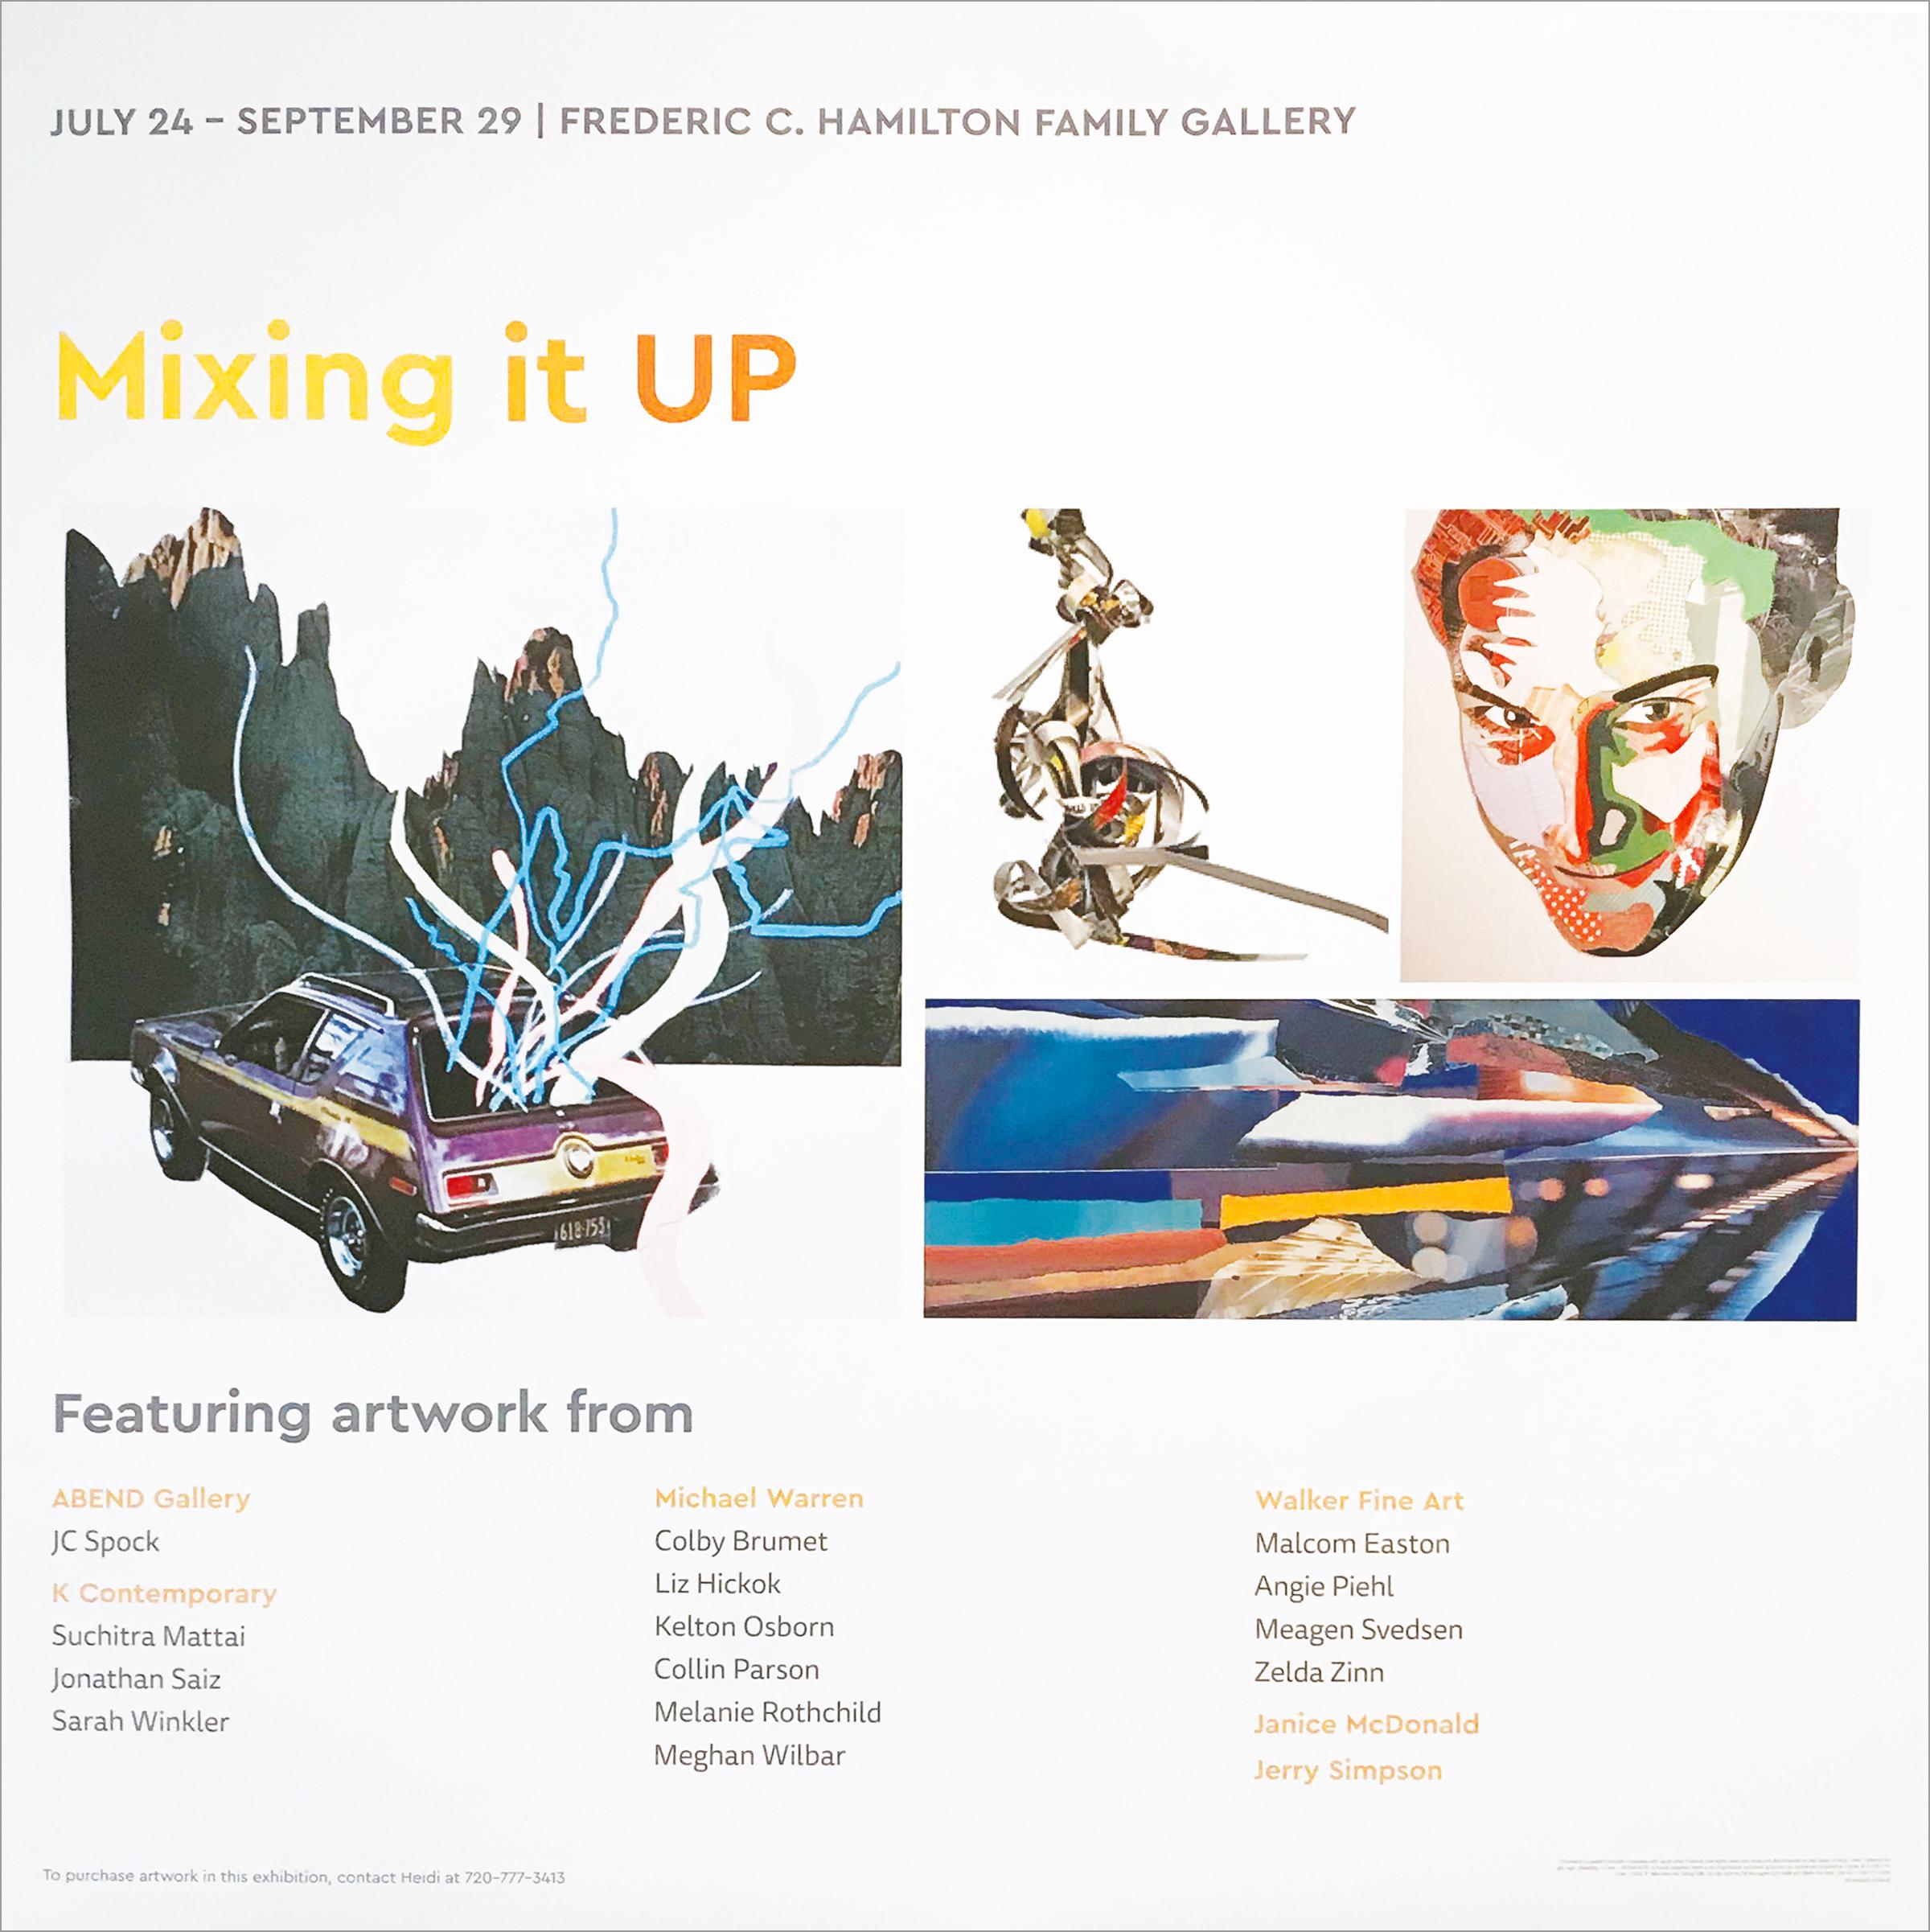 MixingItUp_CH_poster.jpg